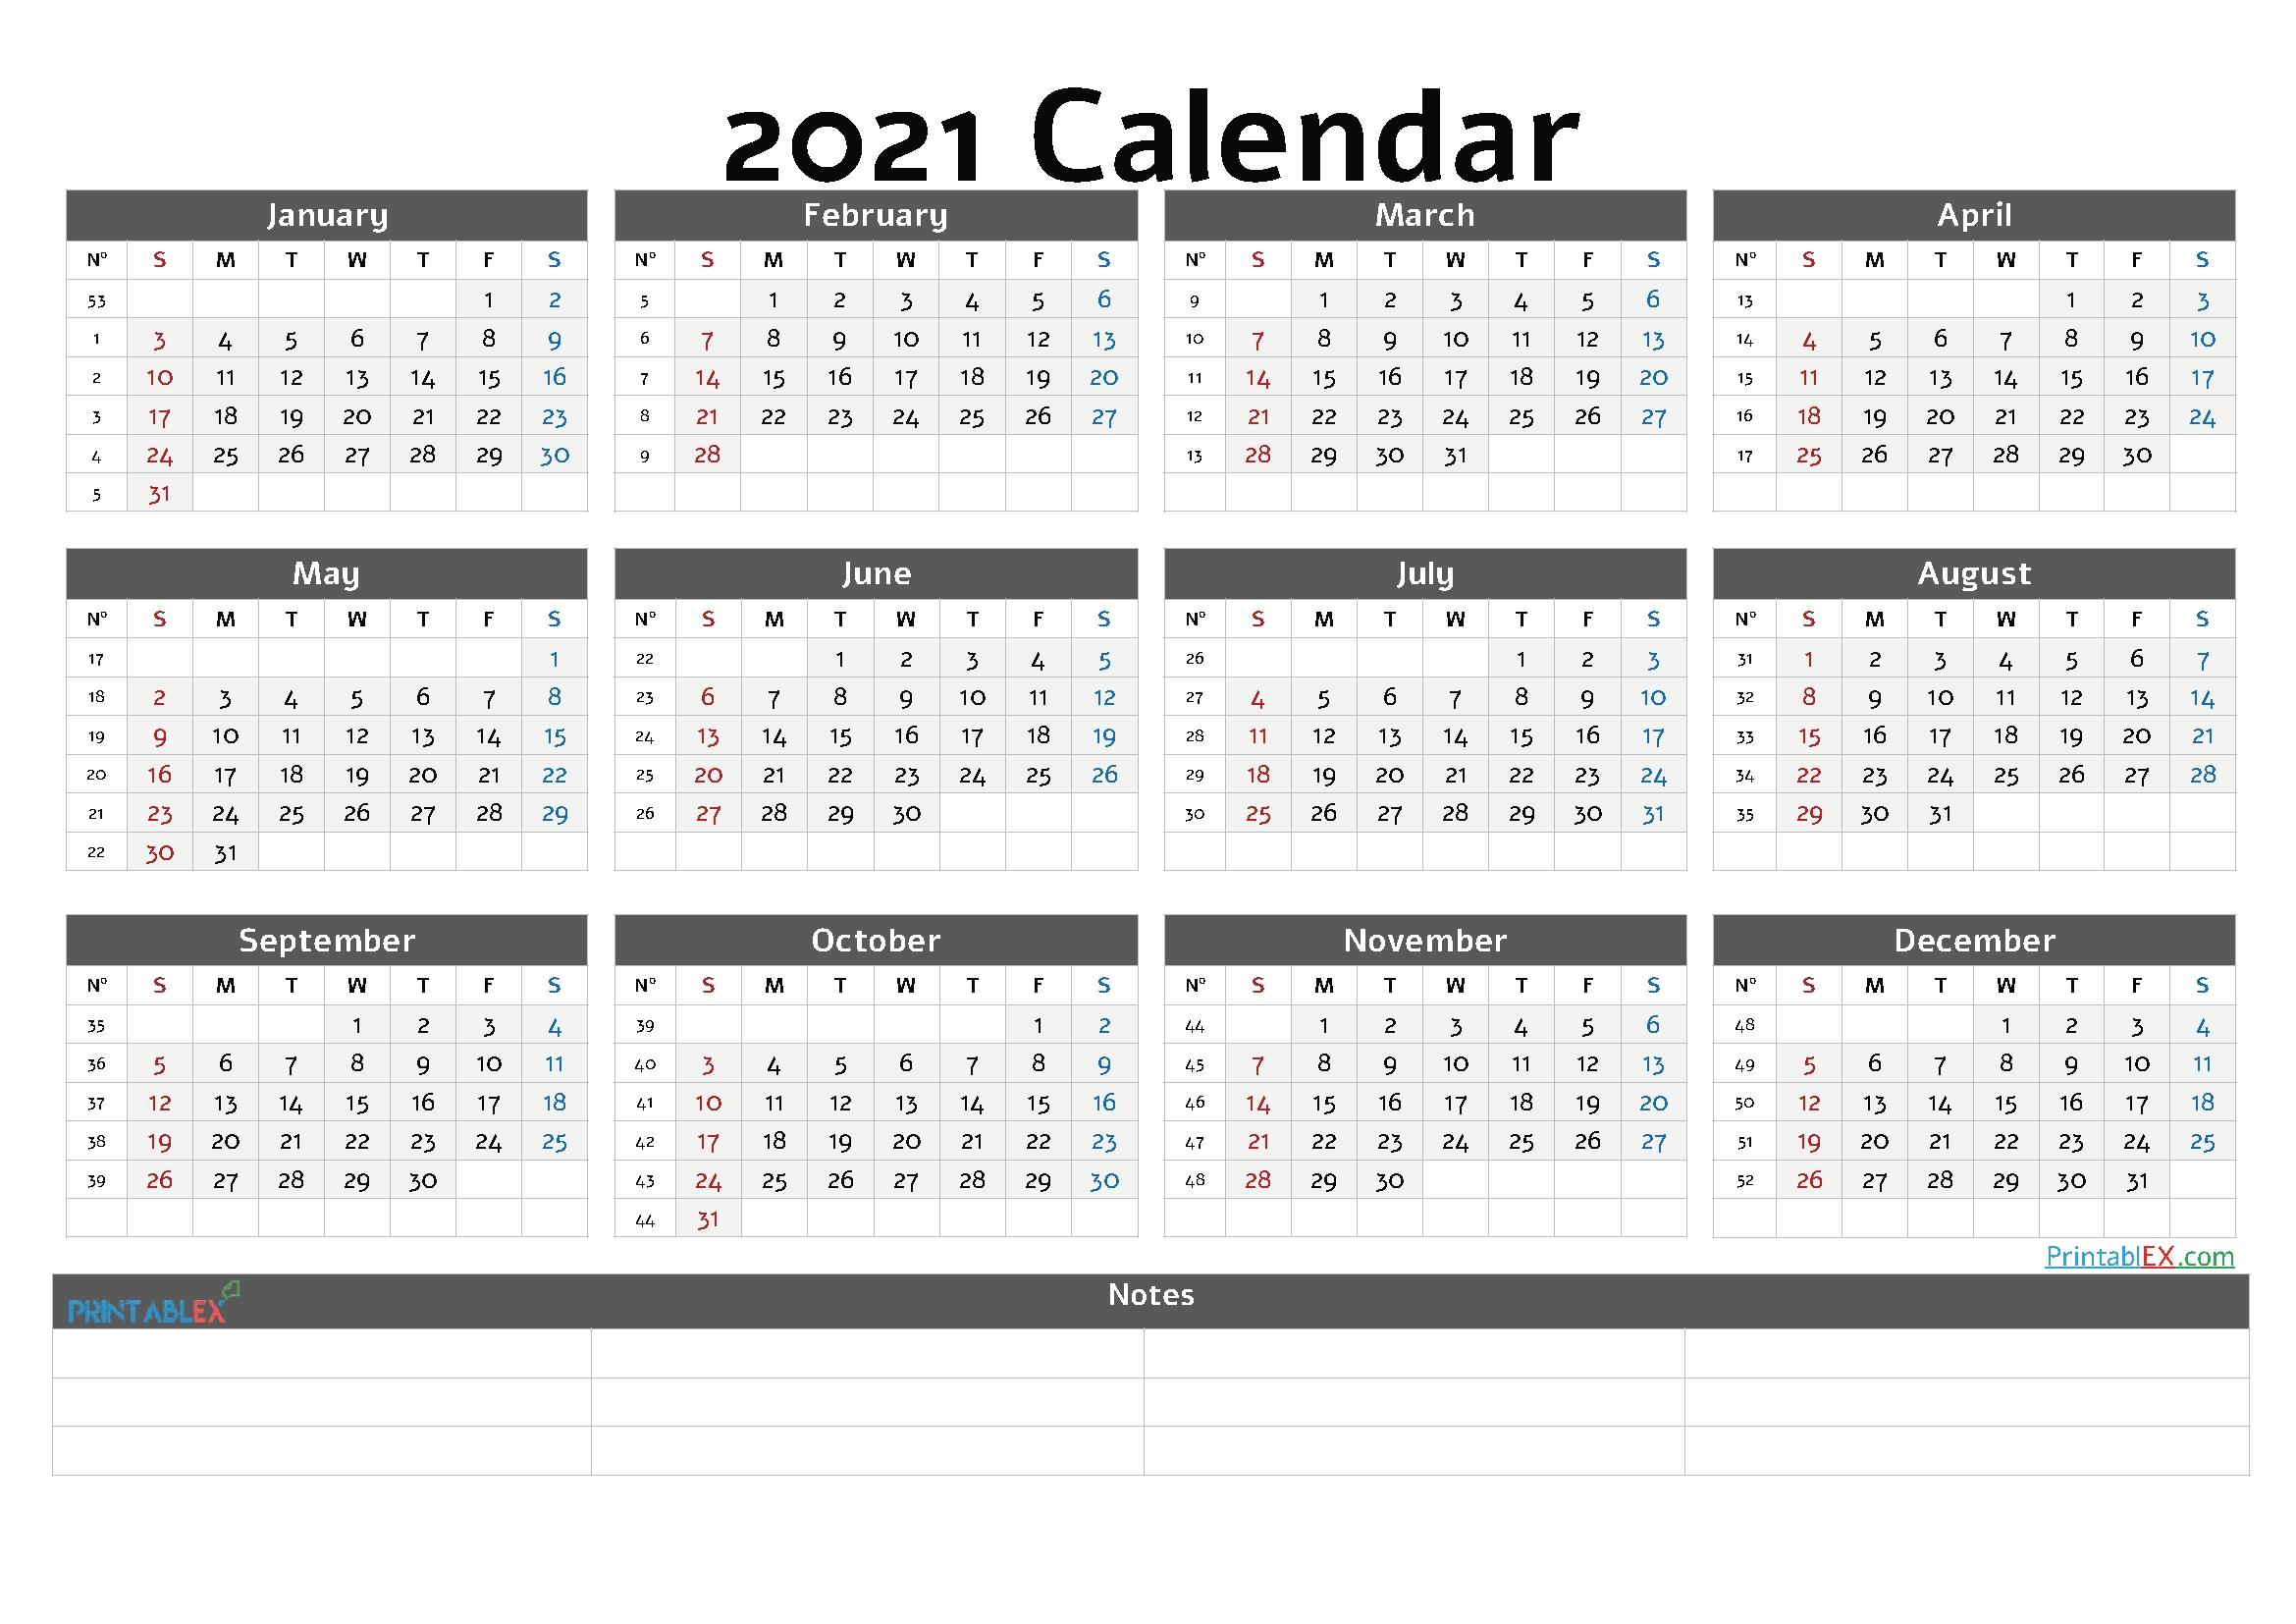 2021 calendar in weeks | calendar 2021